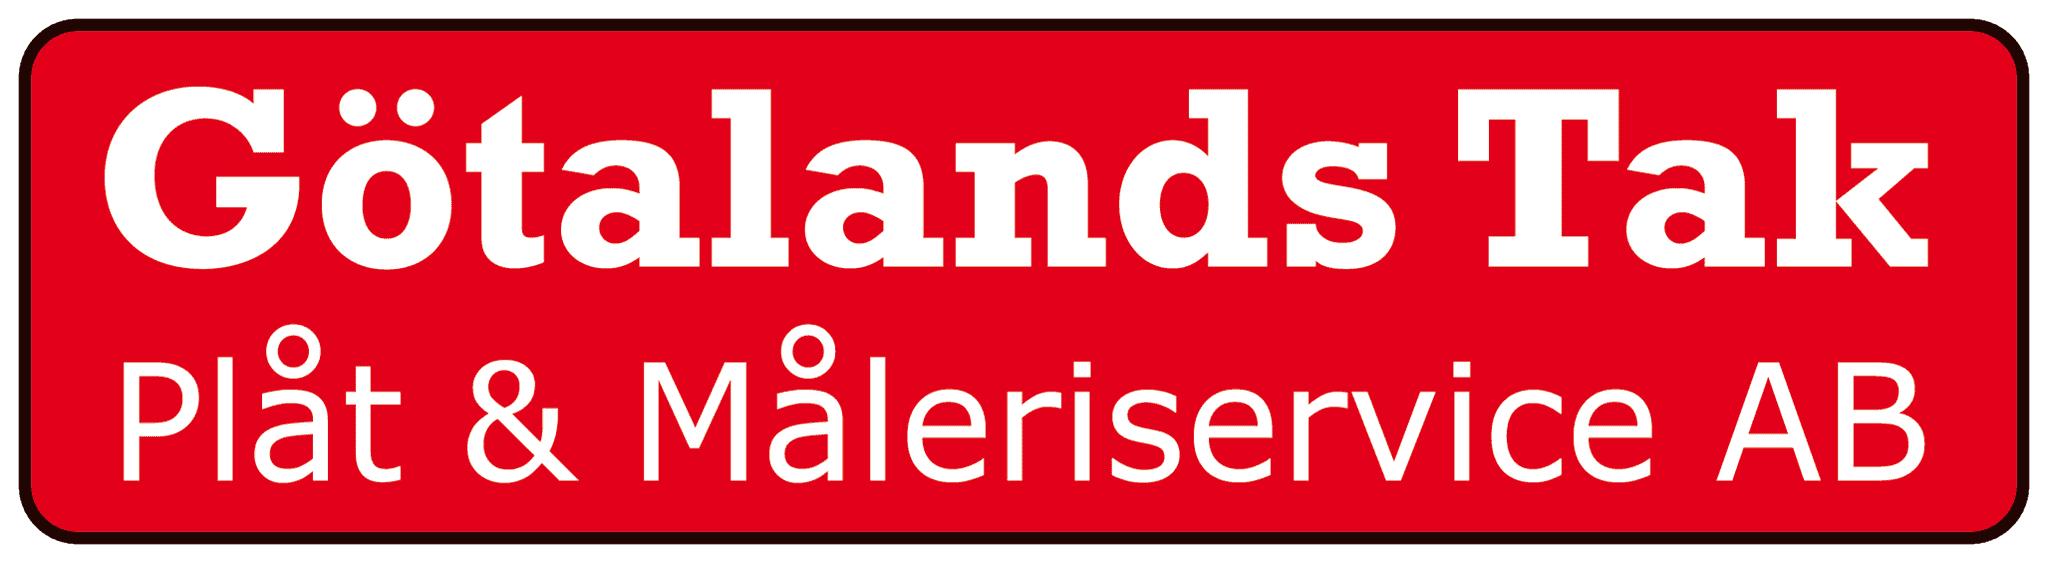 Logotyp för Götalands Tak, Plåt & Måleriservice AB